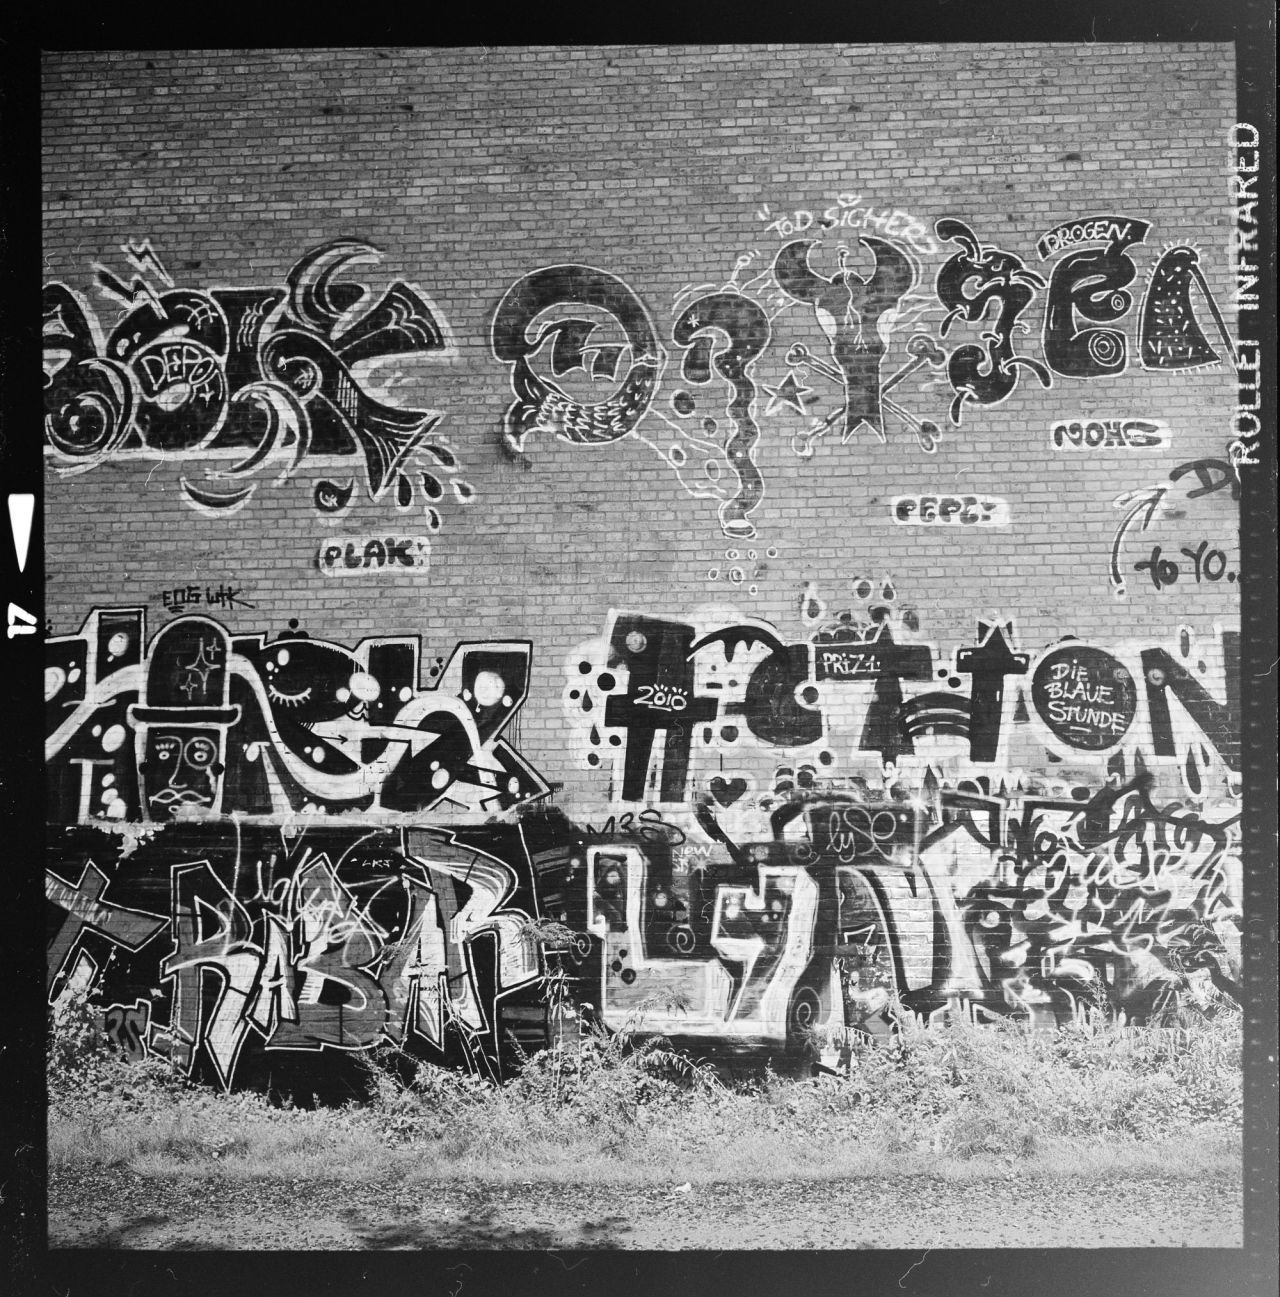 graffiti, berlin - last week rolleiflex f